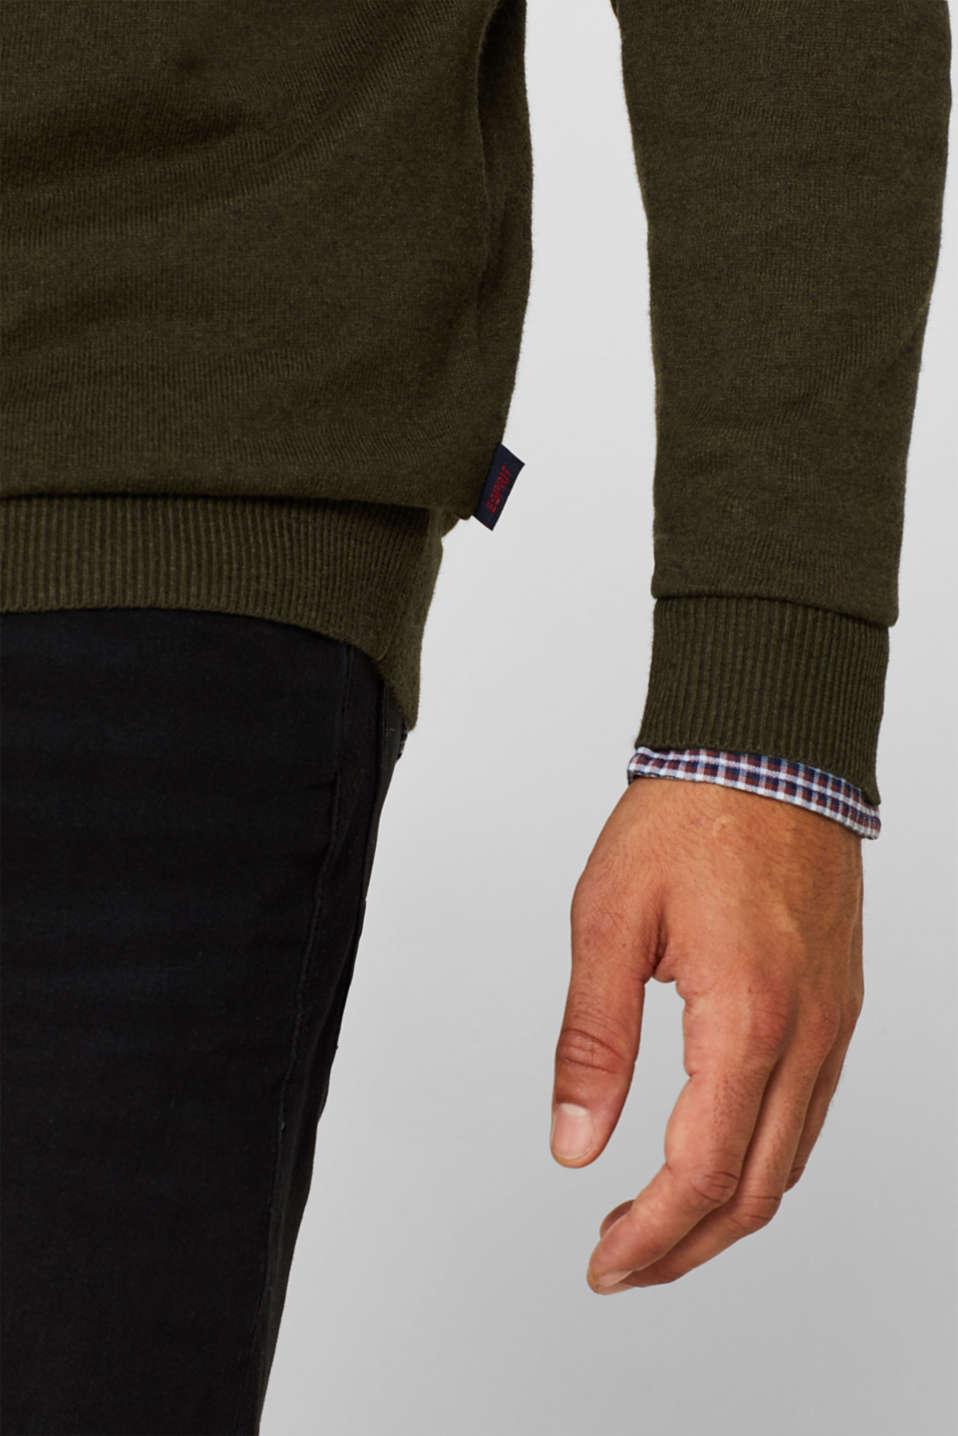 With cashmere: Basic style jumper, DARK KHAKI, detail image number 2